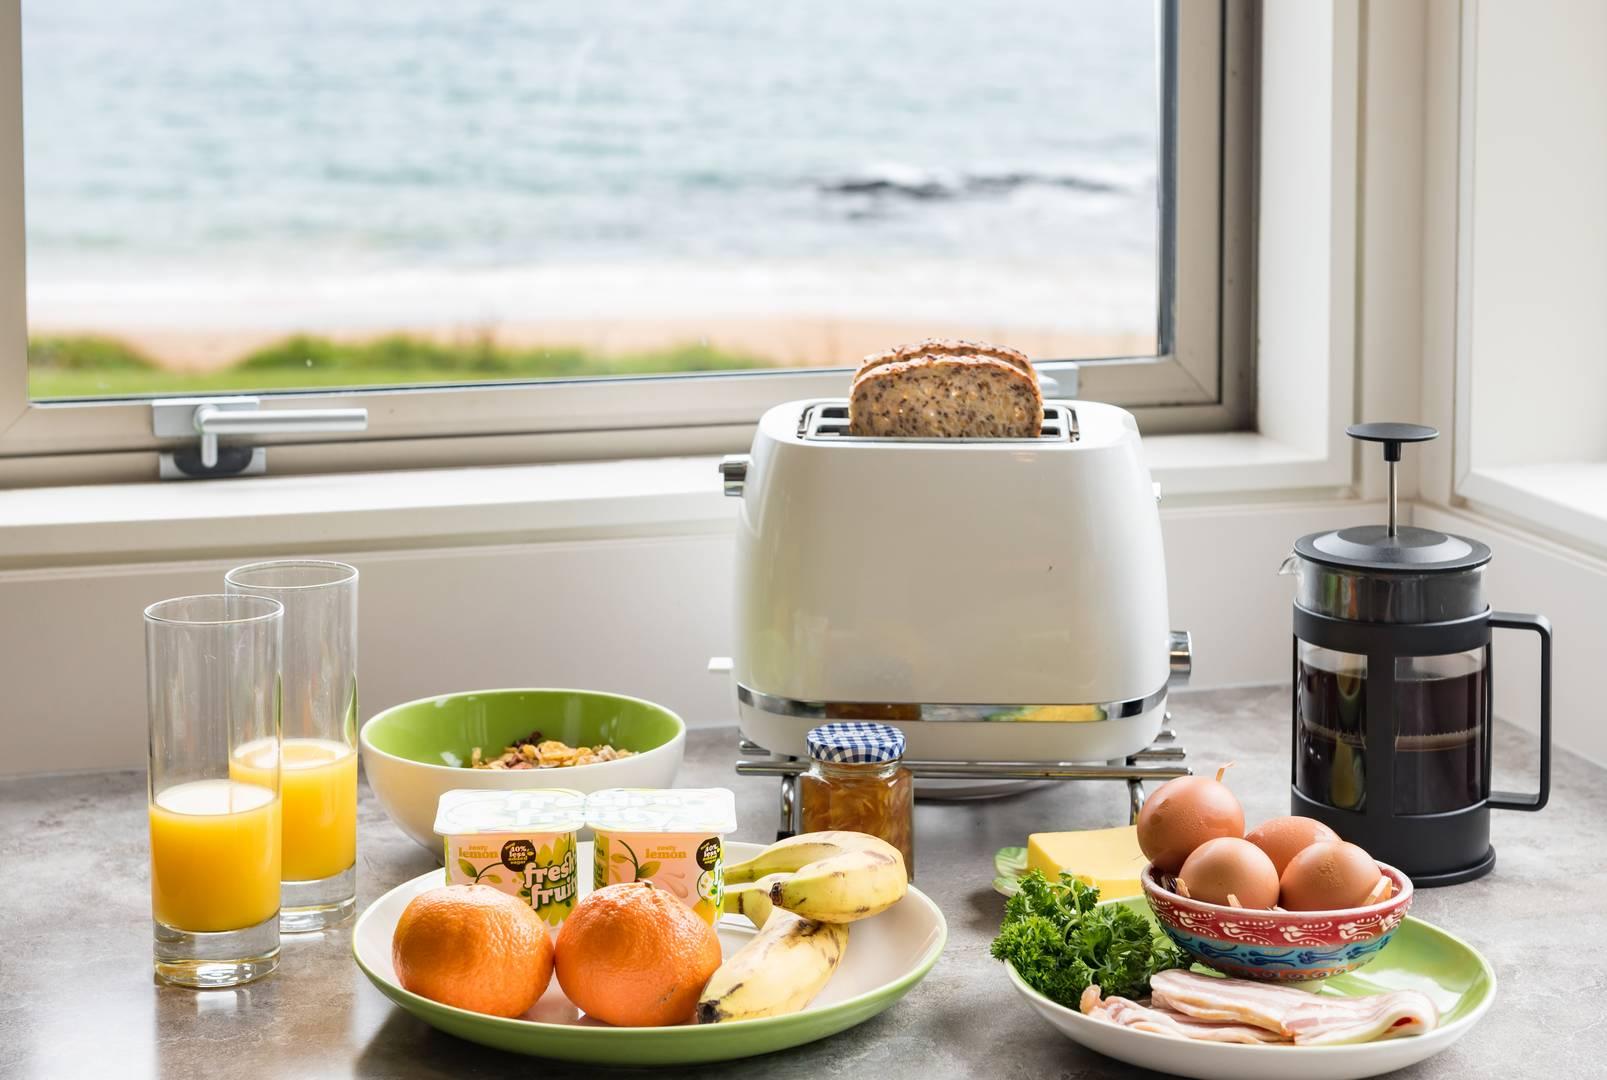 Breakfast at the Golden Sand beachfront accommodation